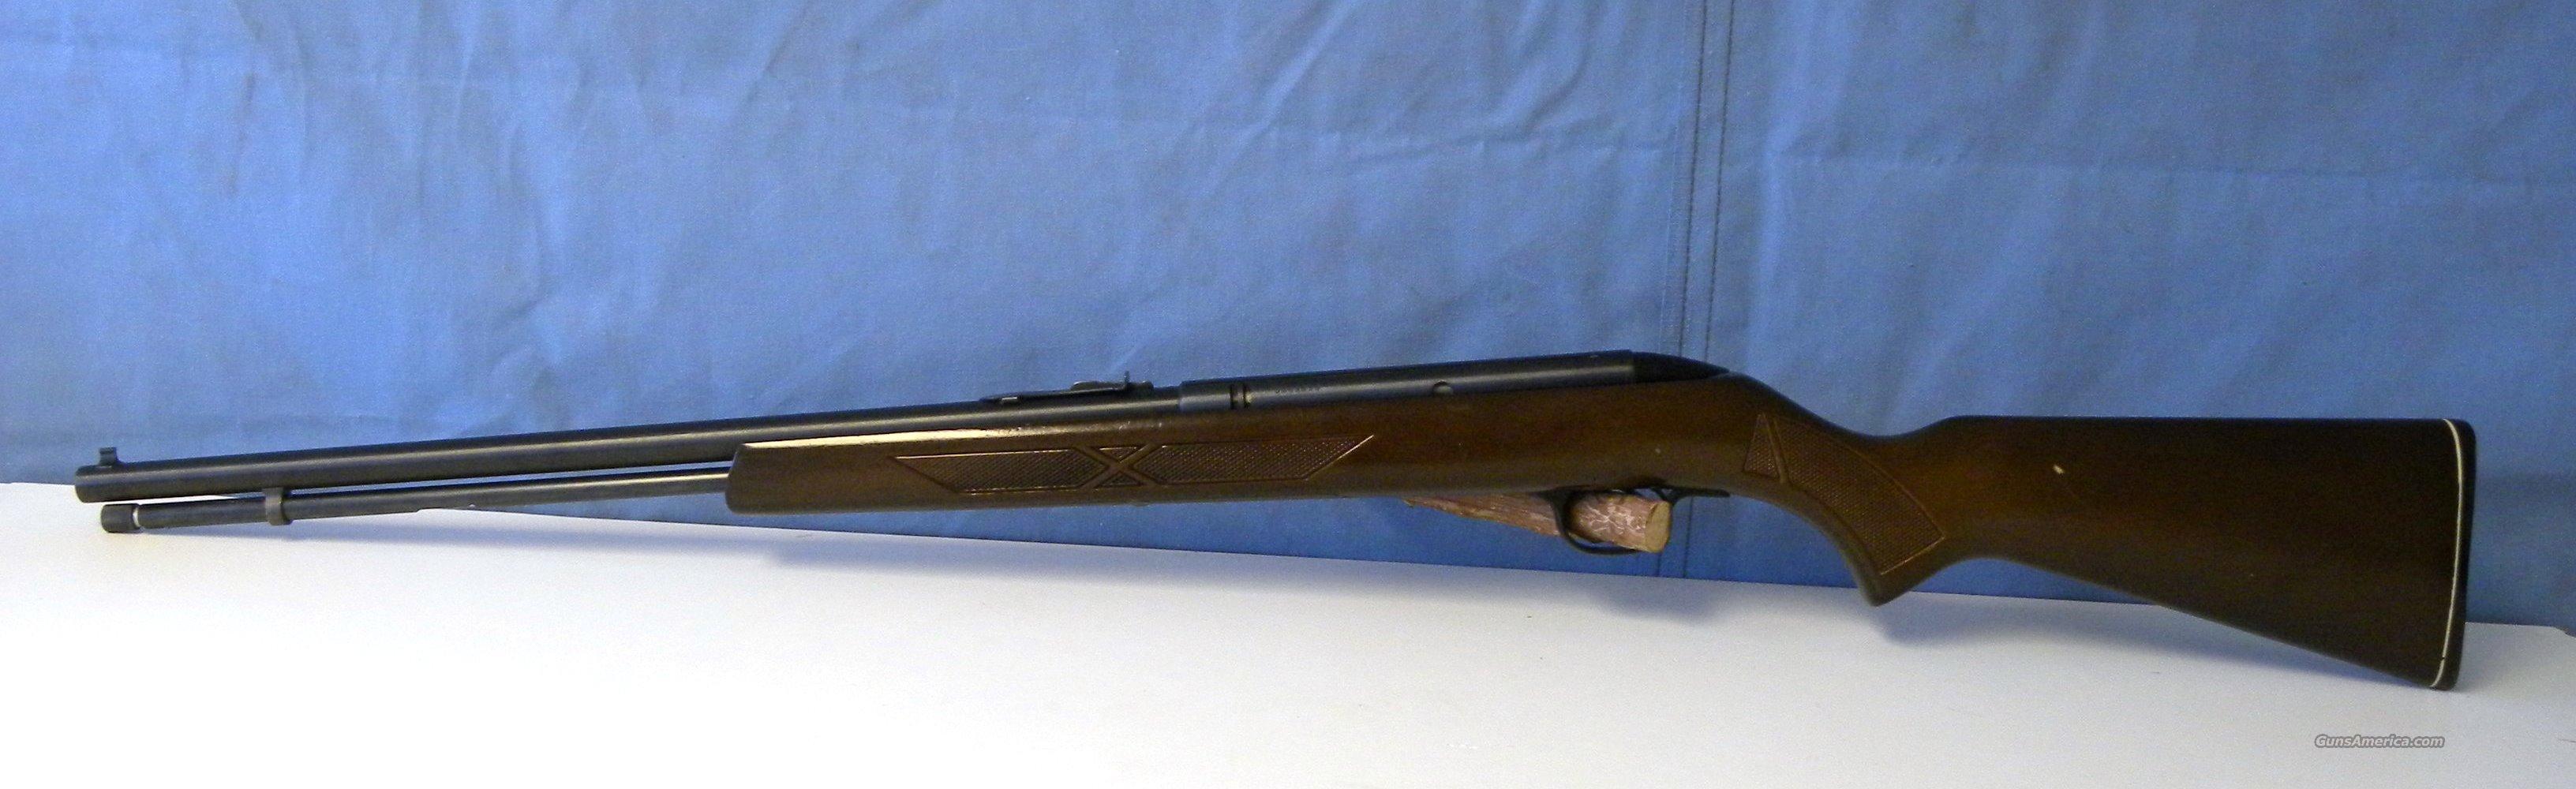 Sears 2200 (Savage 187 A)  Guns > Rifles > Savage Rifles > Other